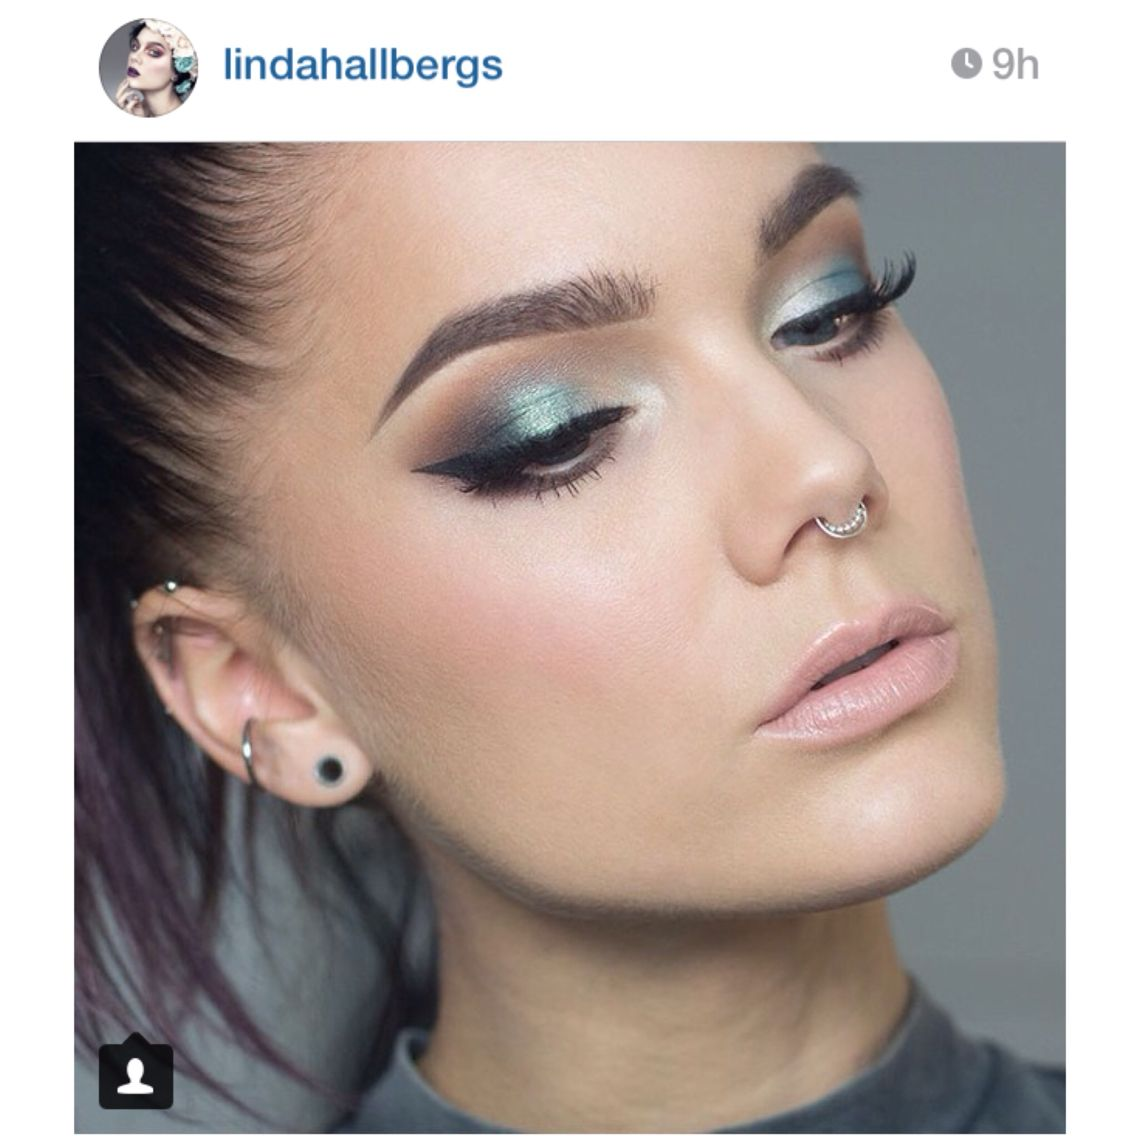 Linda Hallberg Makeup Eye Makeup Inspirations Piercings Septum